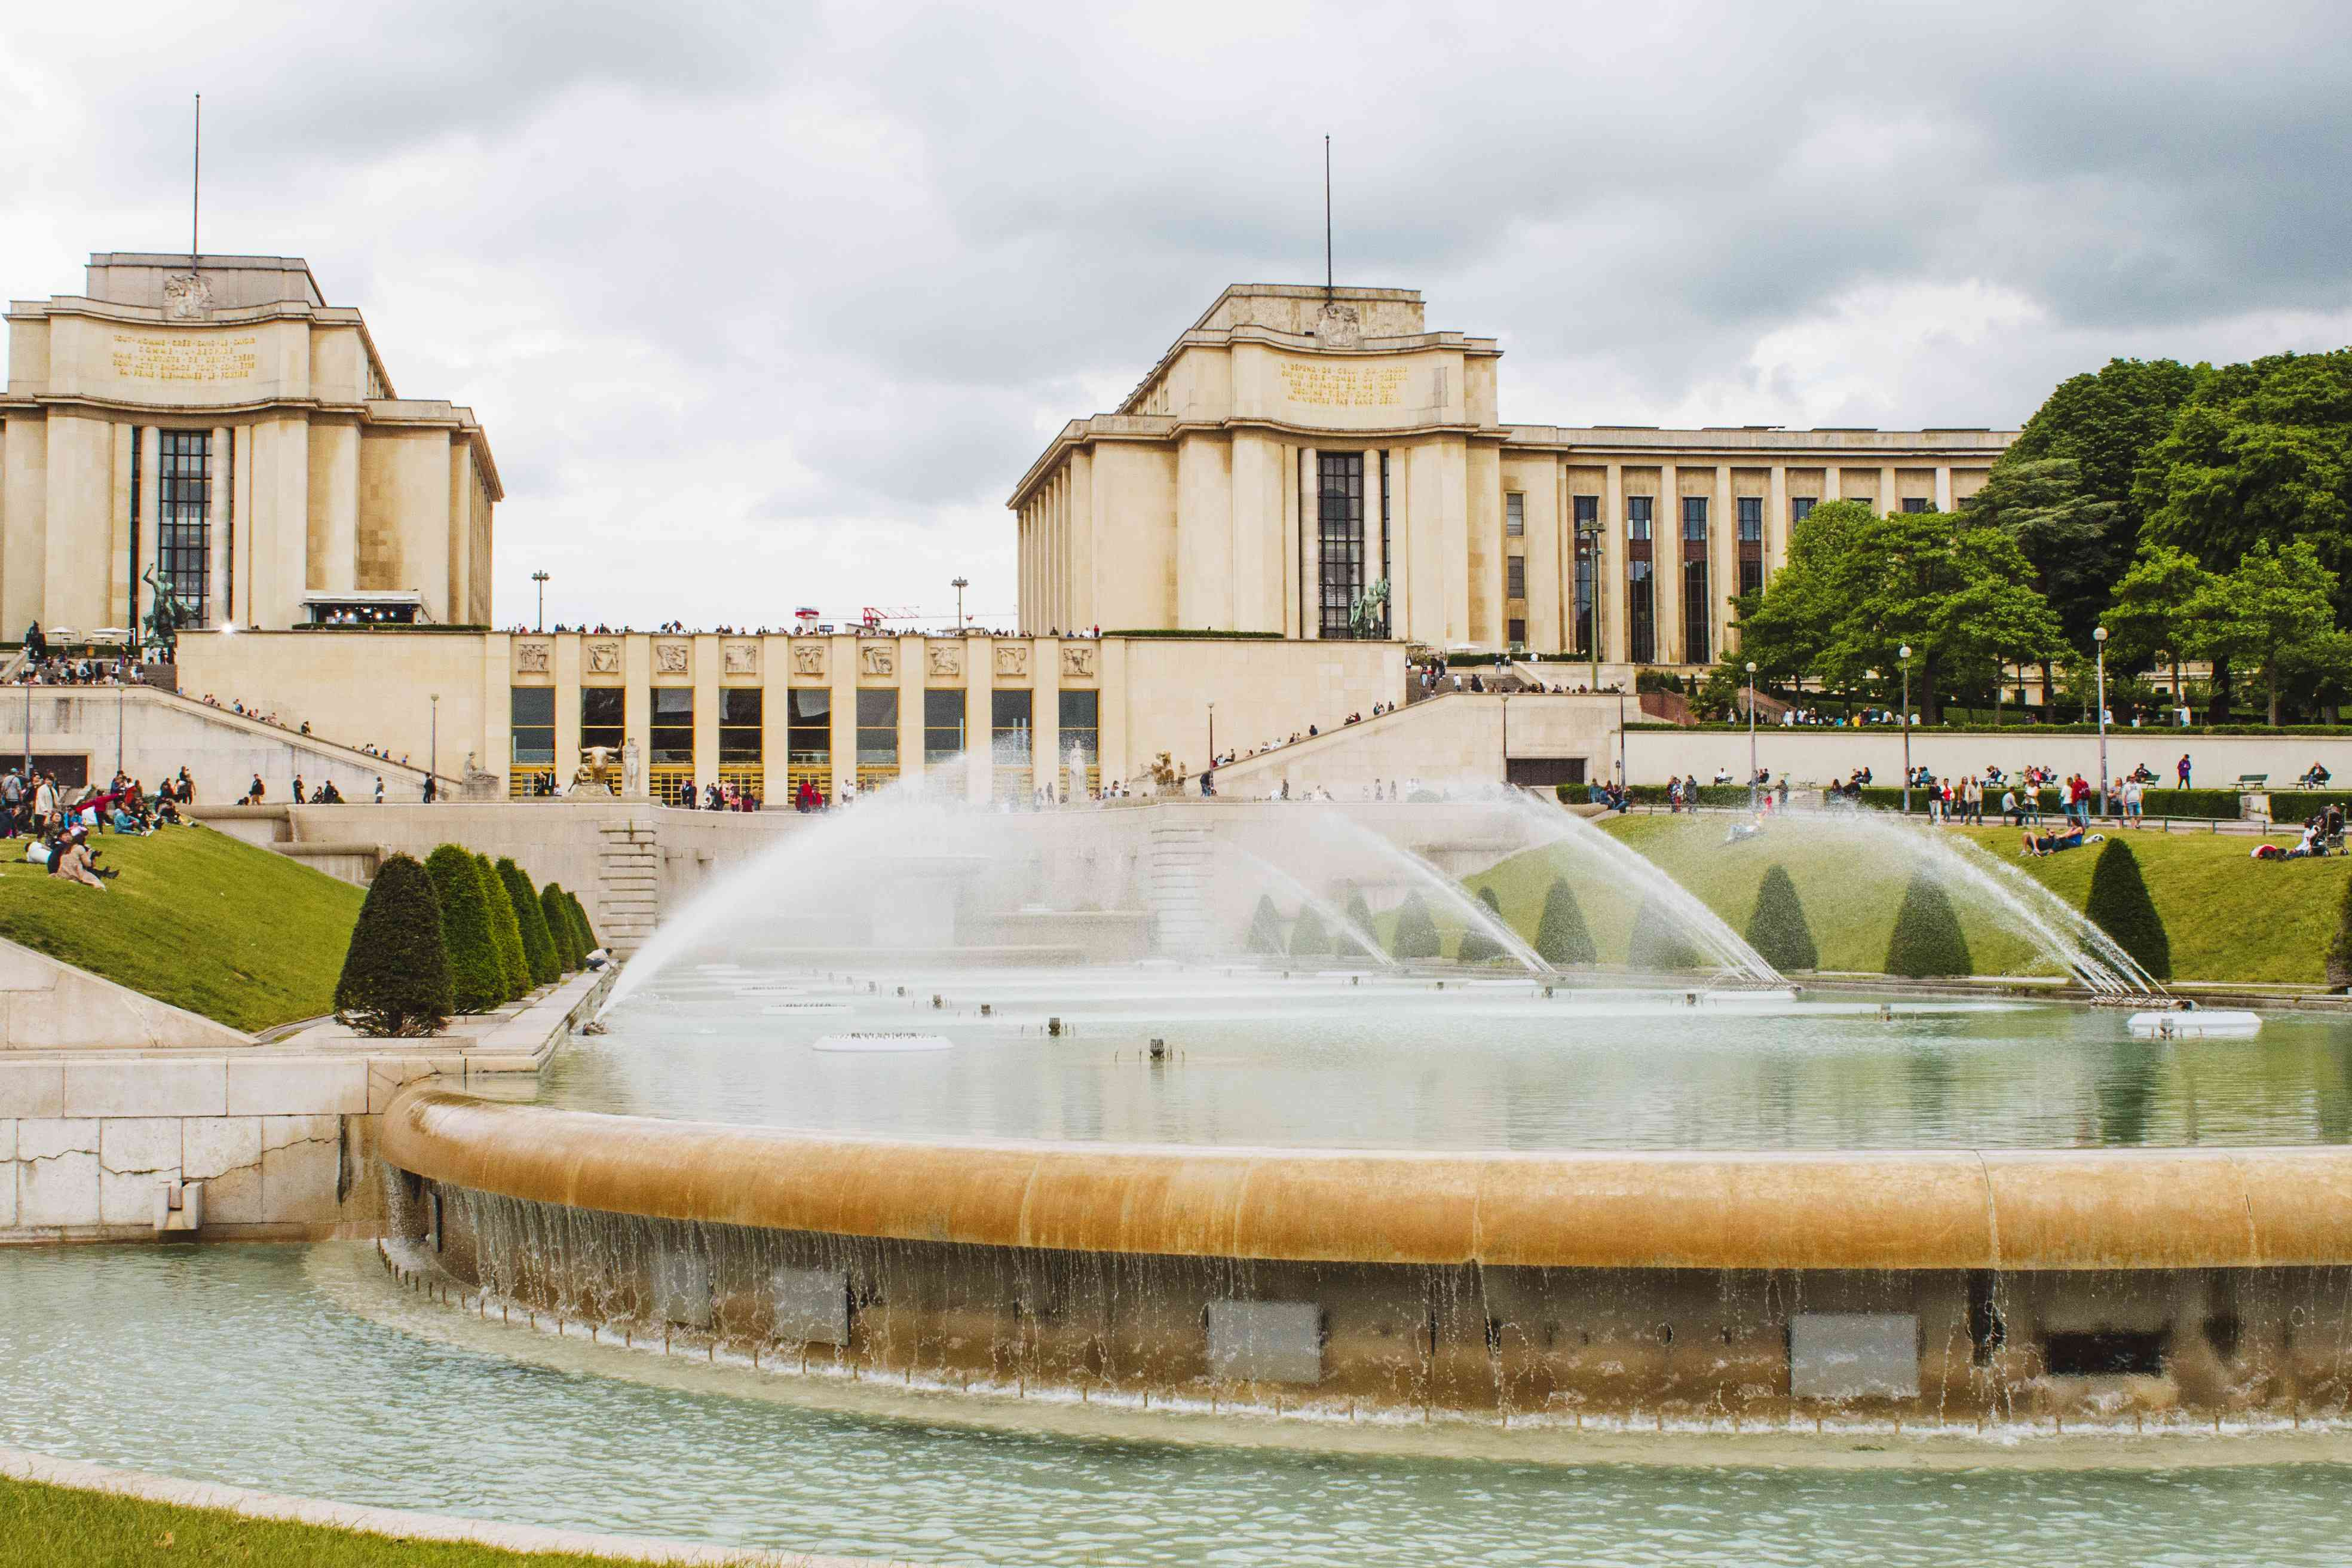 Fountains in Trocadero Gardens